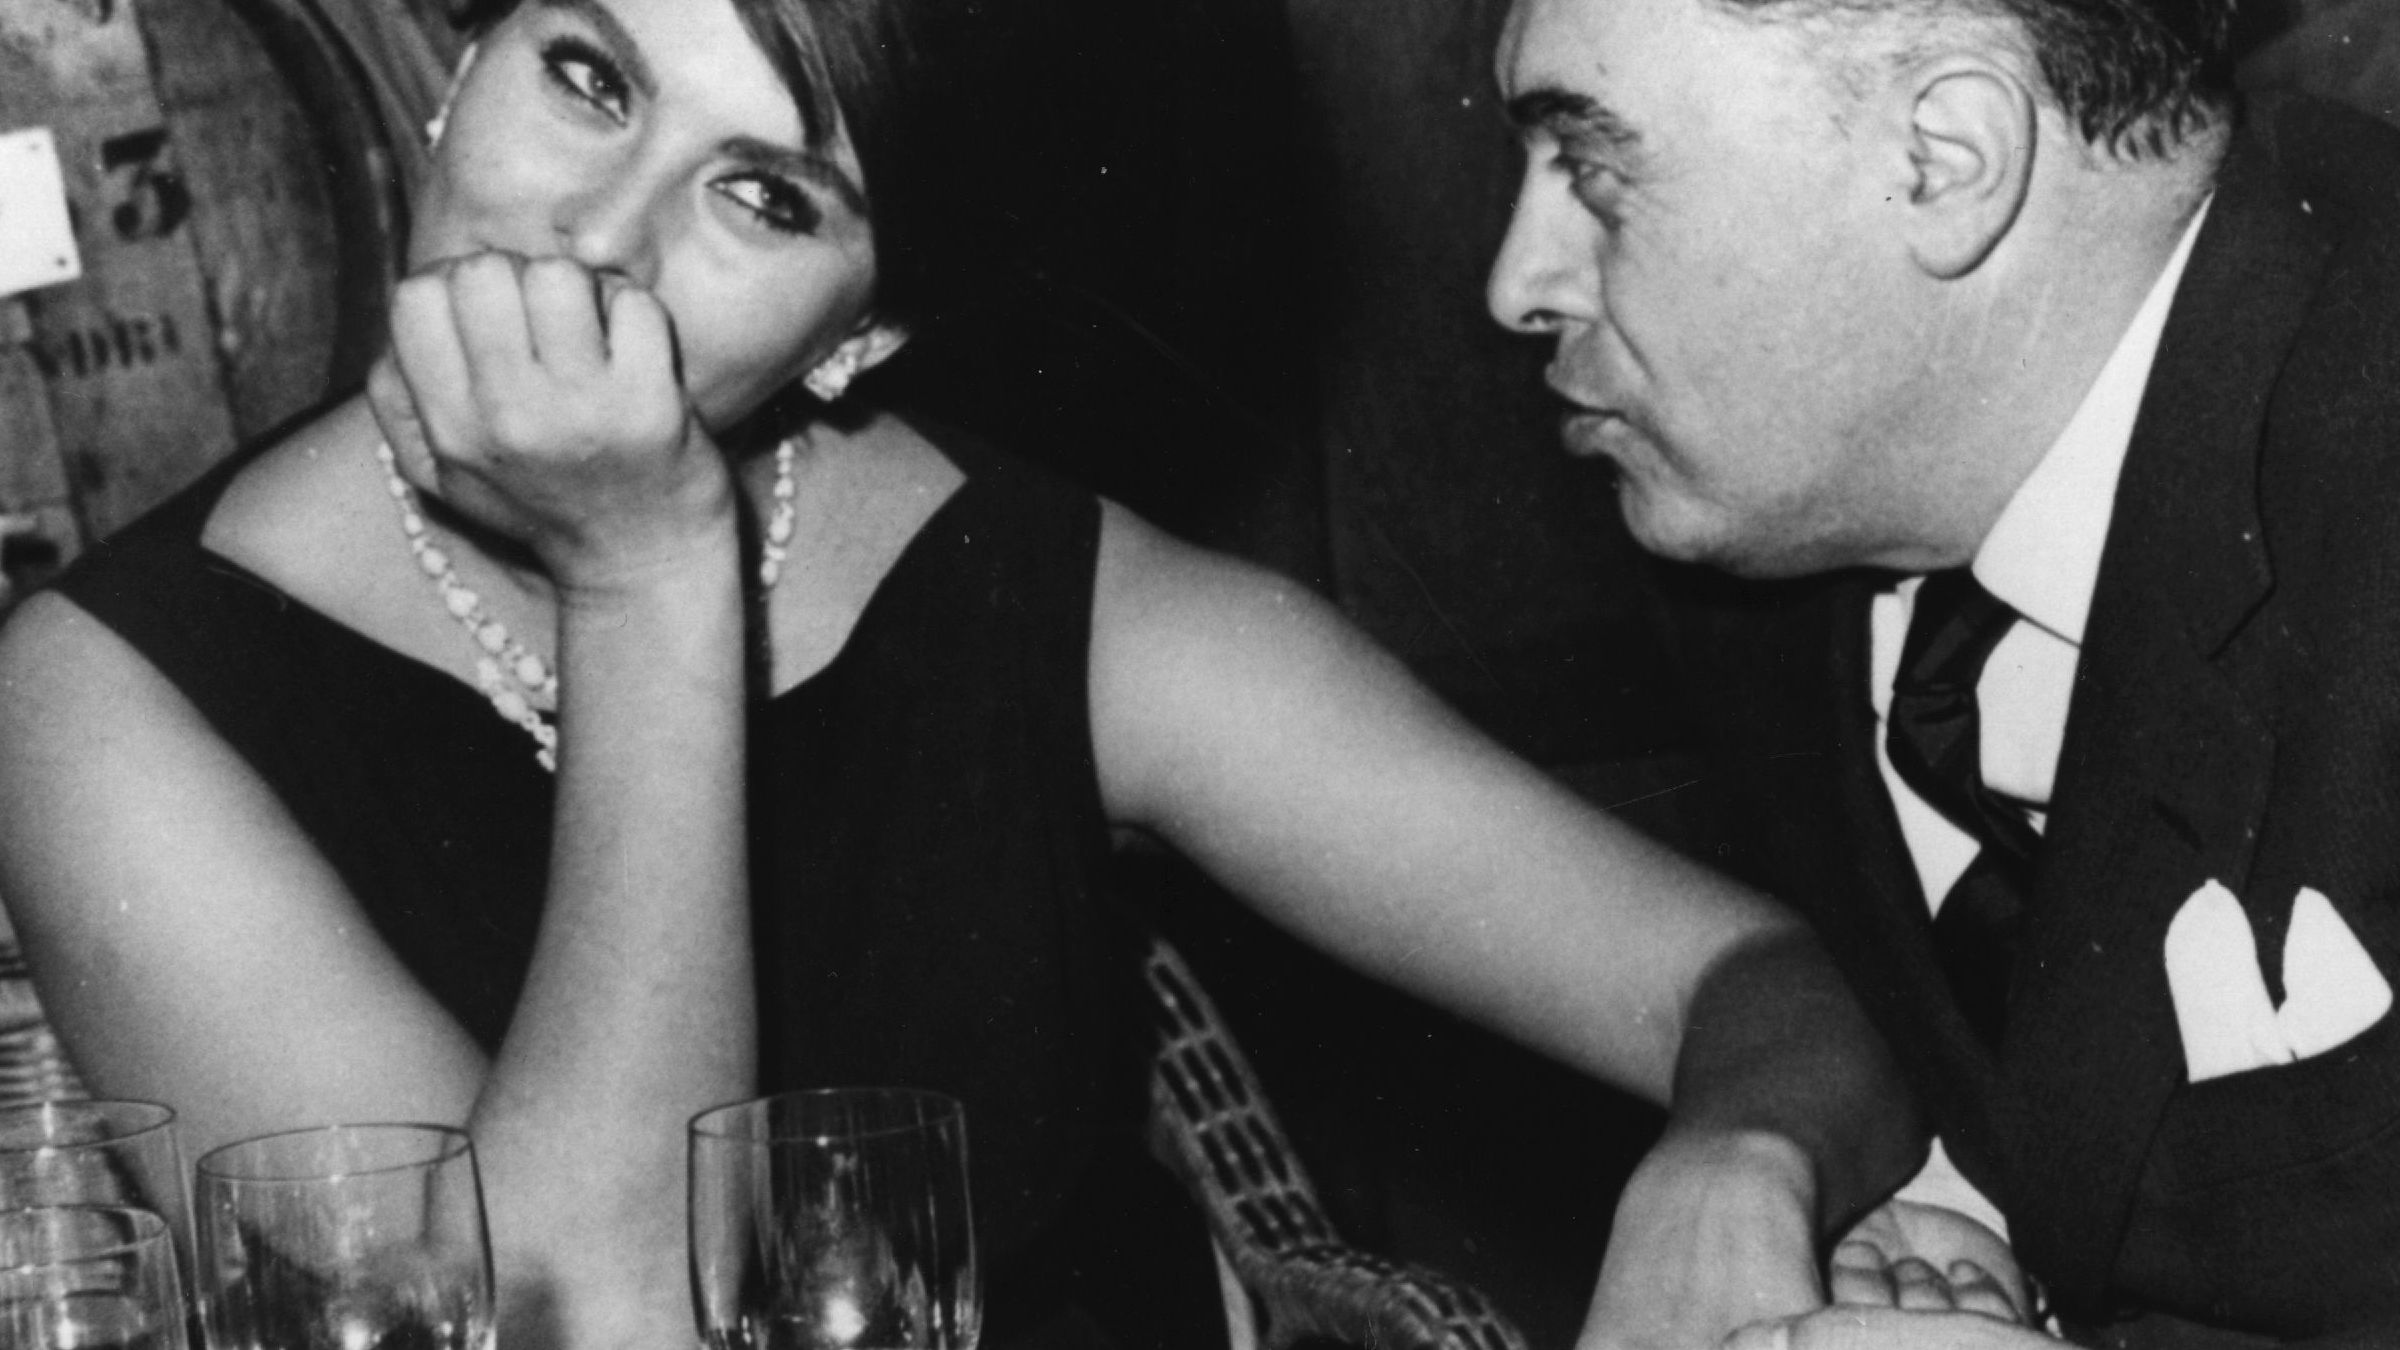 Sophia Loren cenando con su marido Carlo Ponti